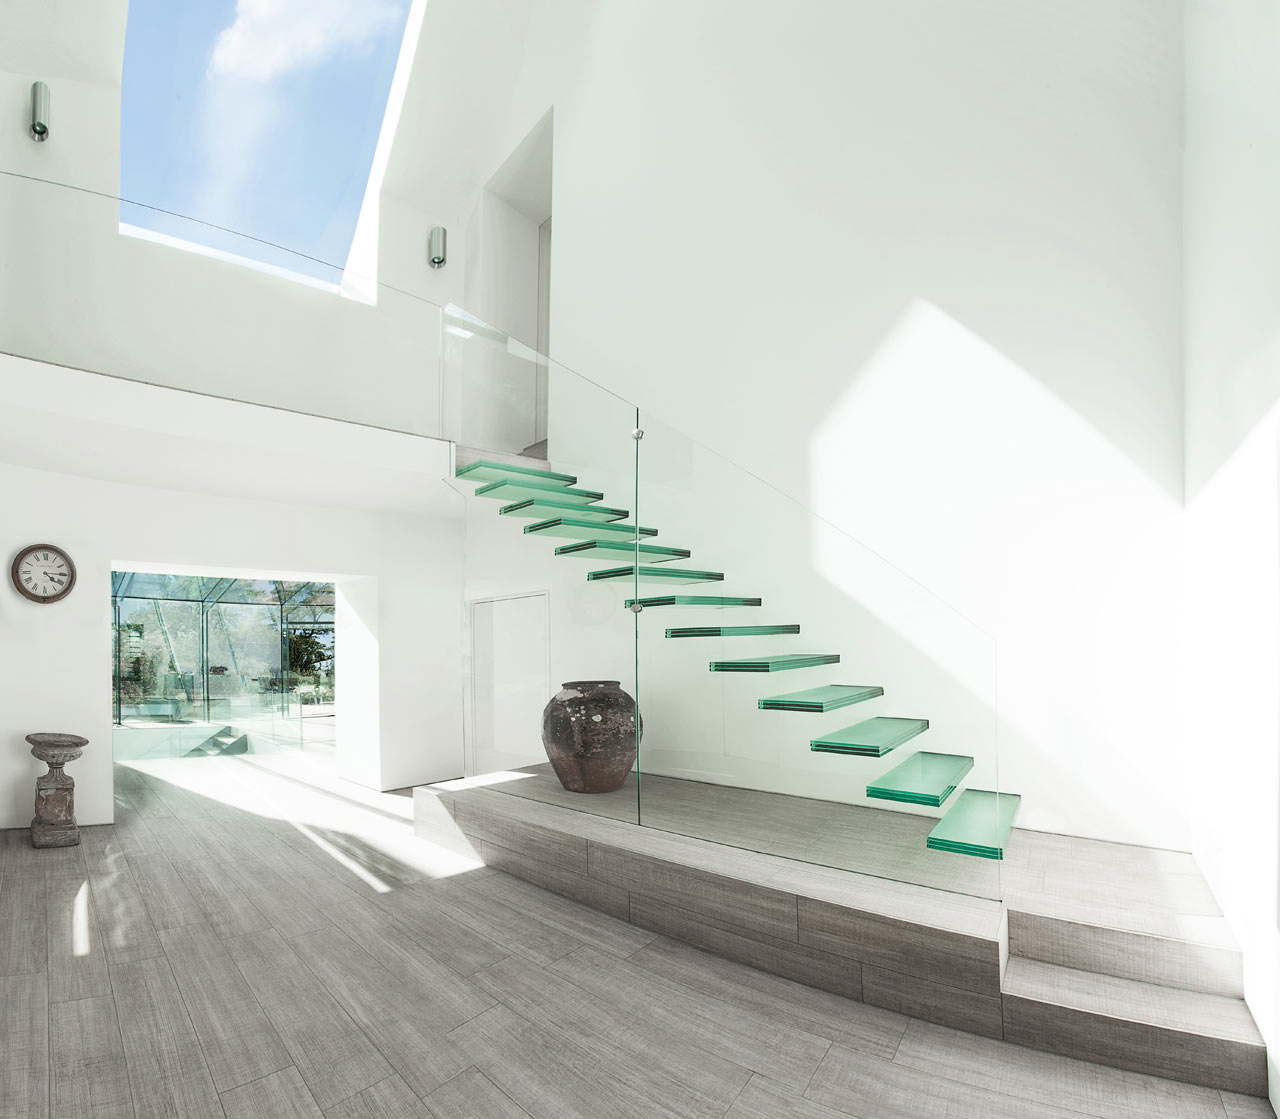 The-Glass-House-AR-Design-Studio-8